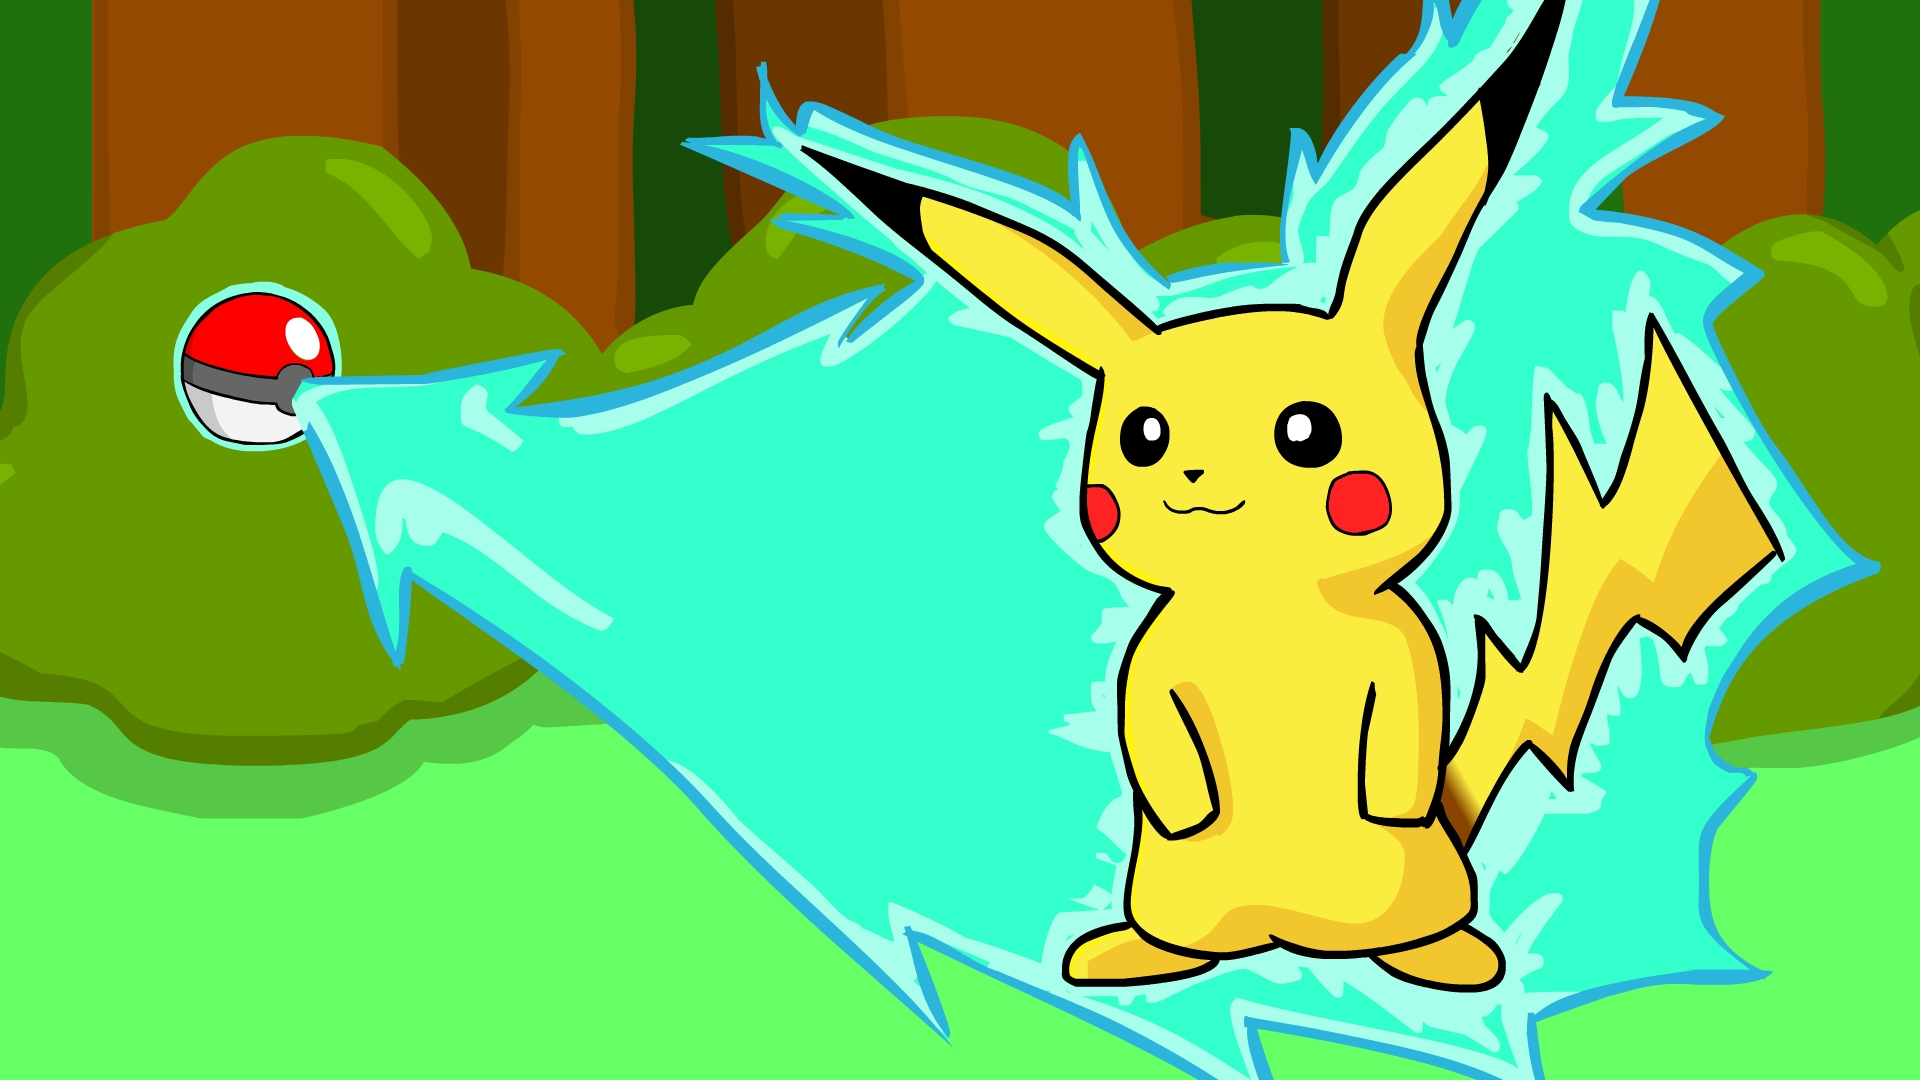 Pokemon Art: Pikachu